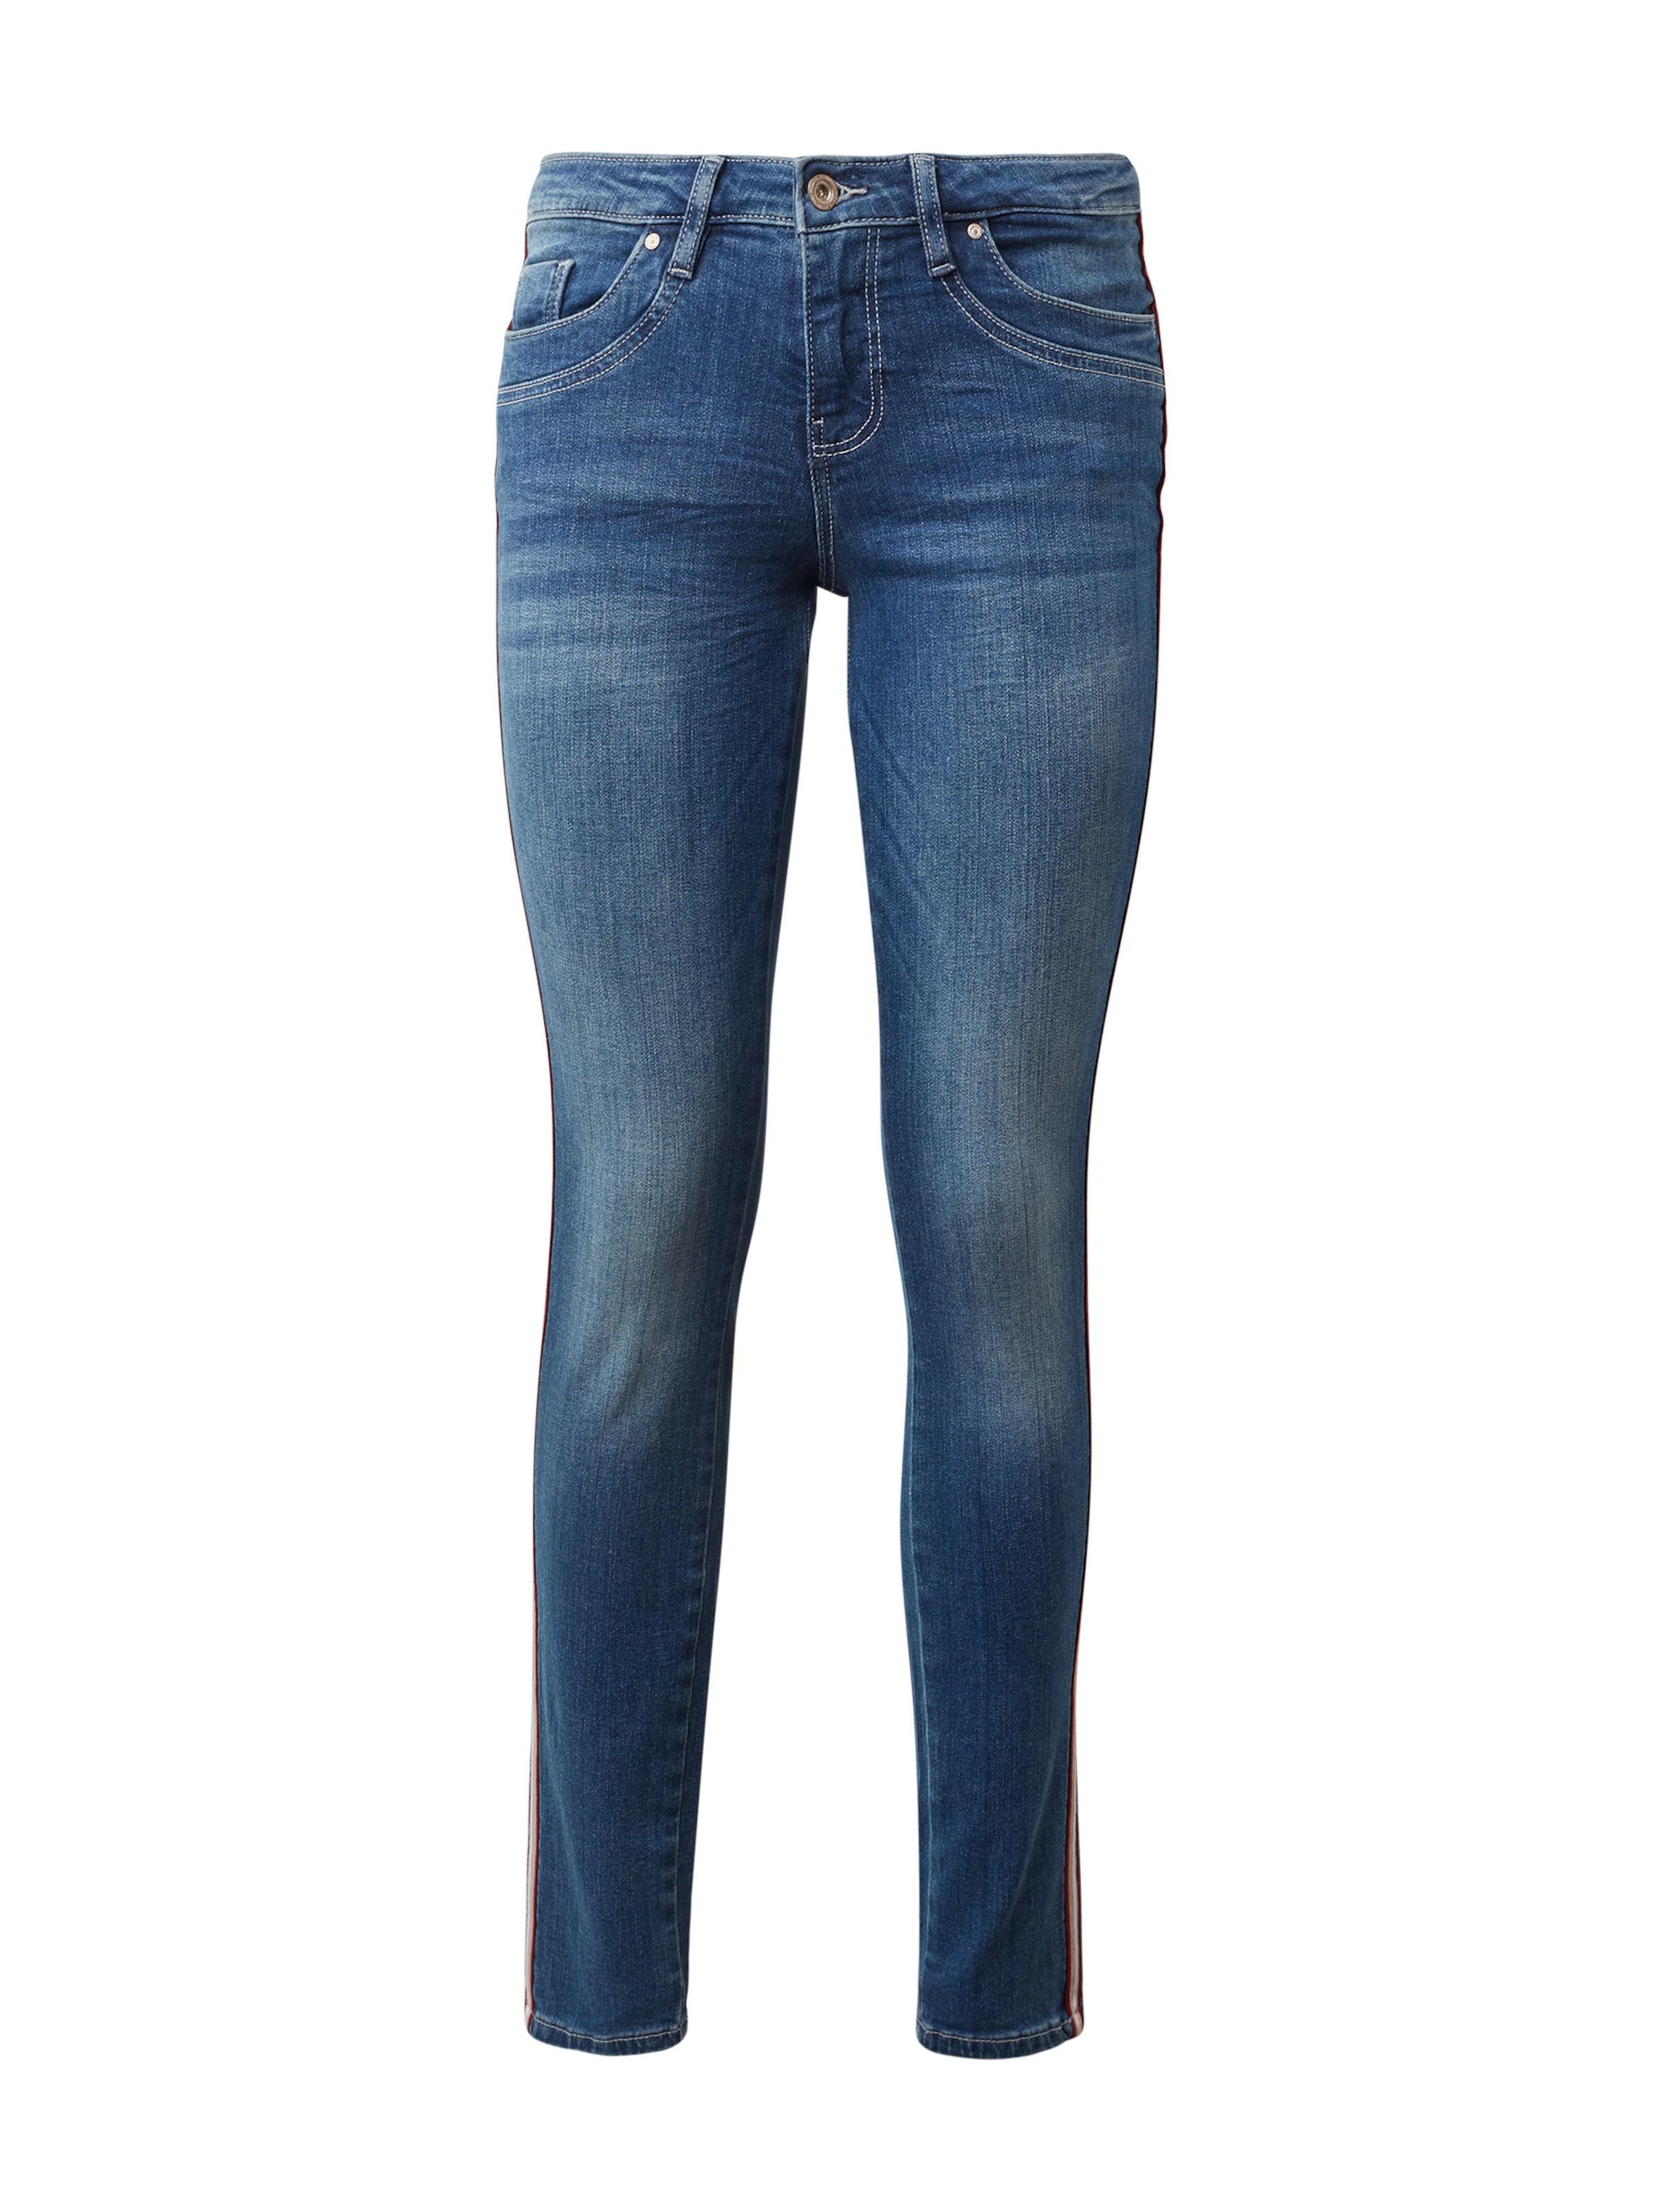 Bleu Blanc En 'alexa' Tom Tailor DenimRouge Jean 4jc5q3SARL